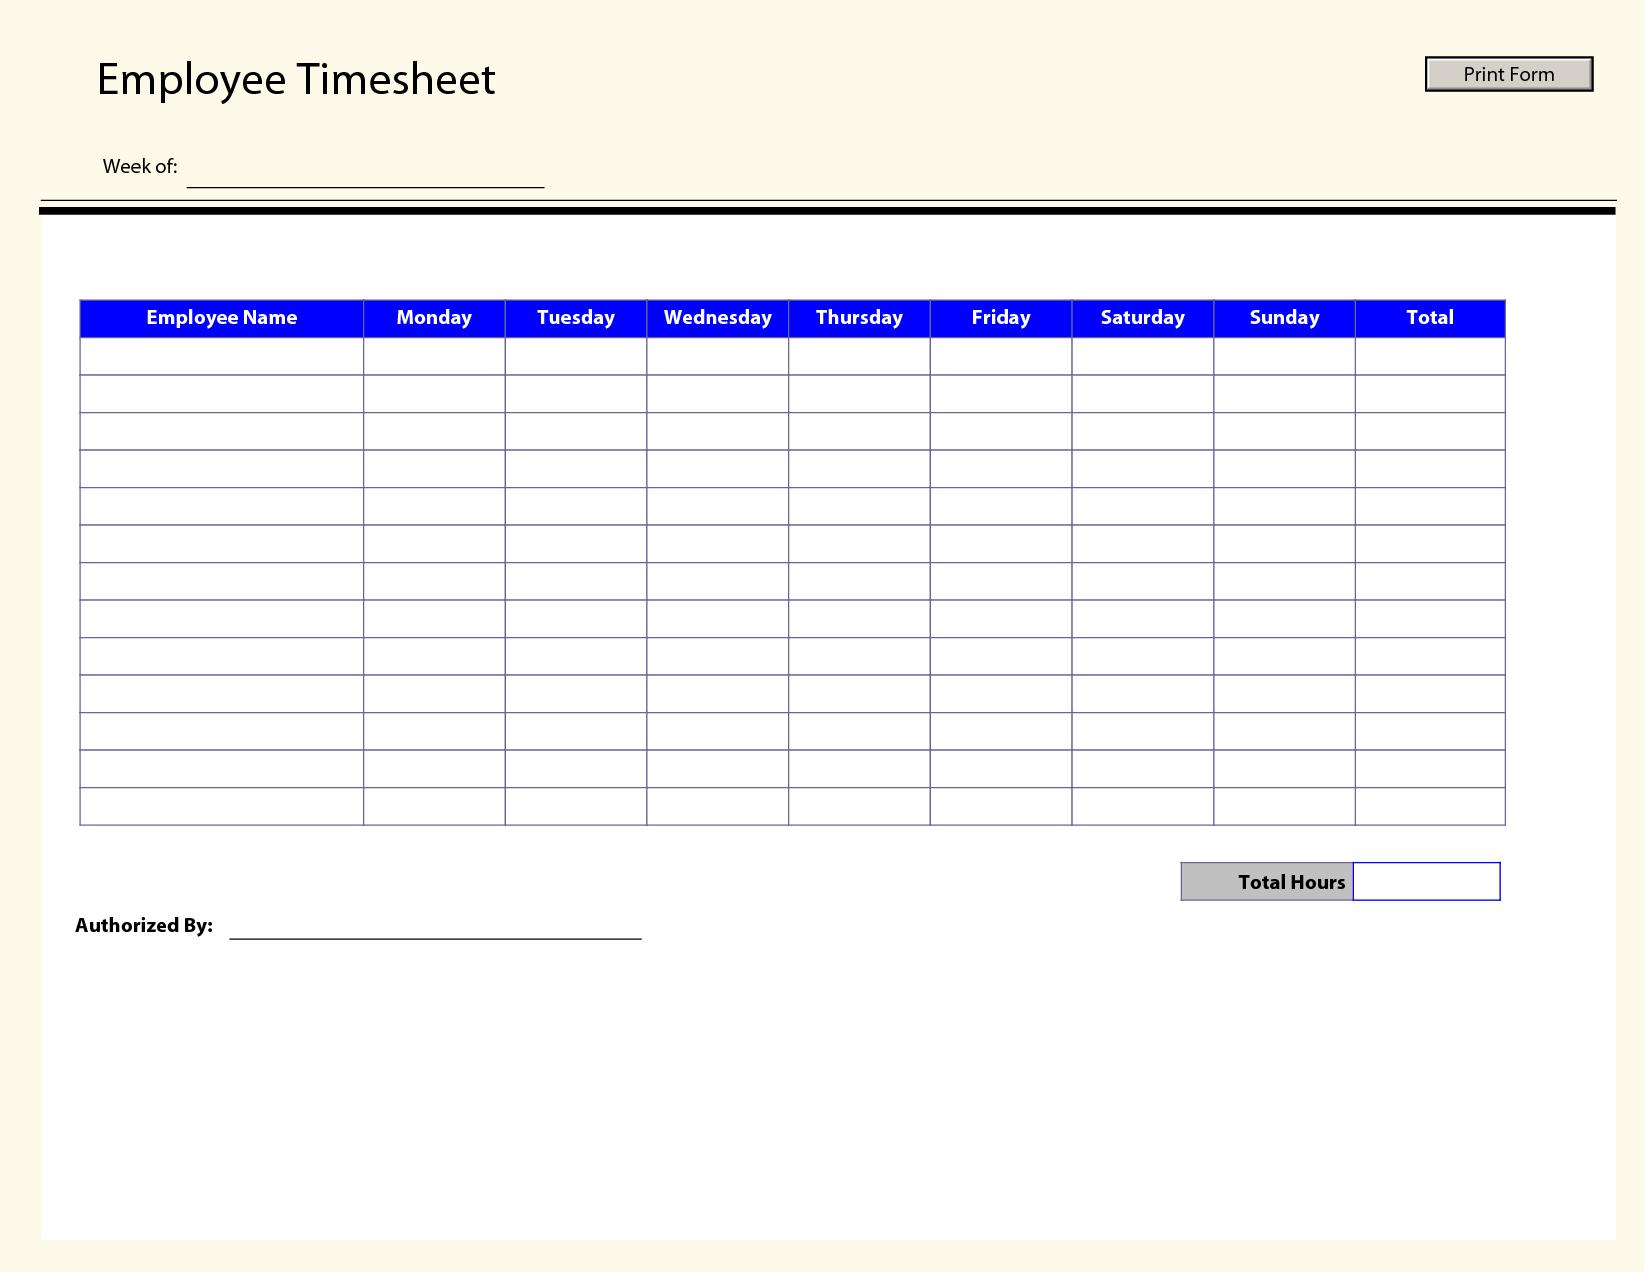 Timesheet Template Free Printable | Rota Template - Free Printable Time Cards